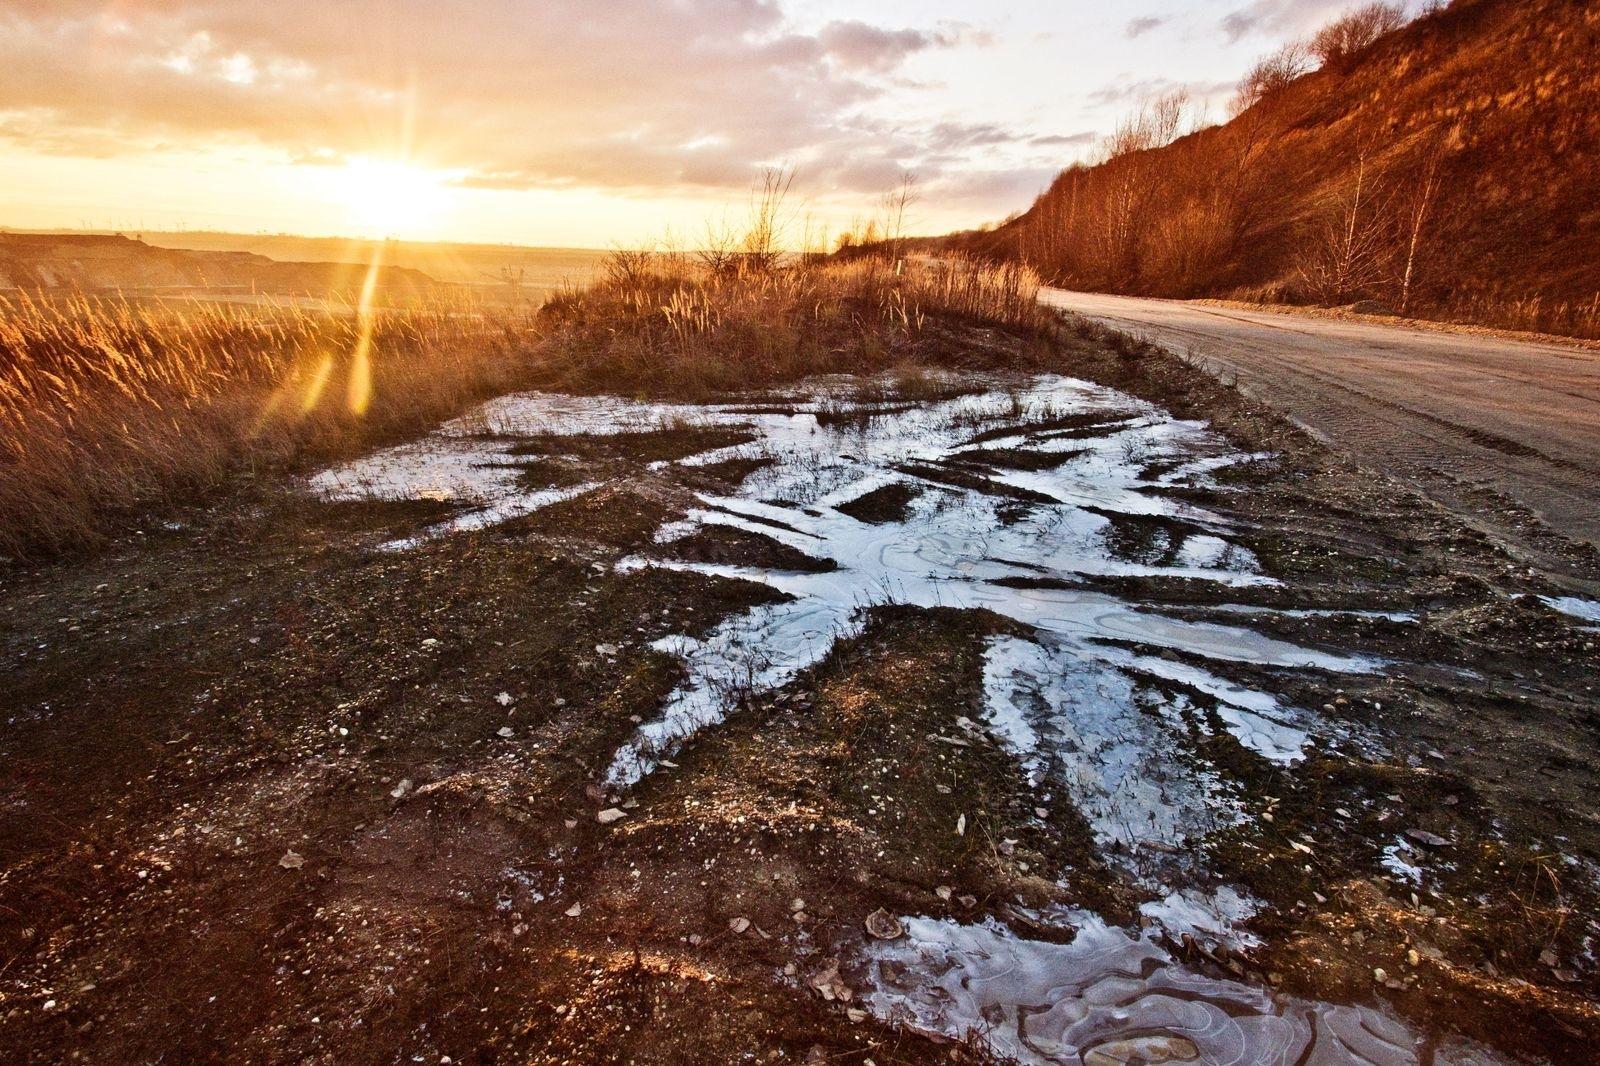 38.Muddy Roads -